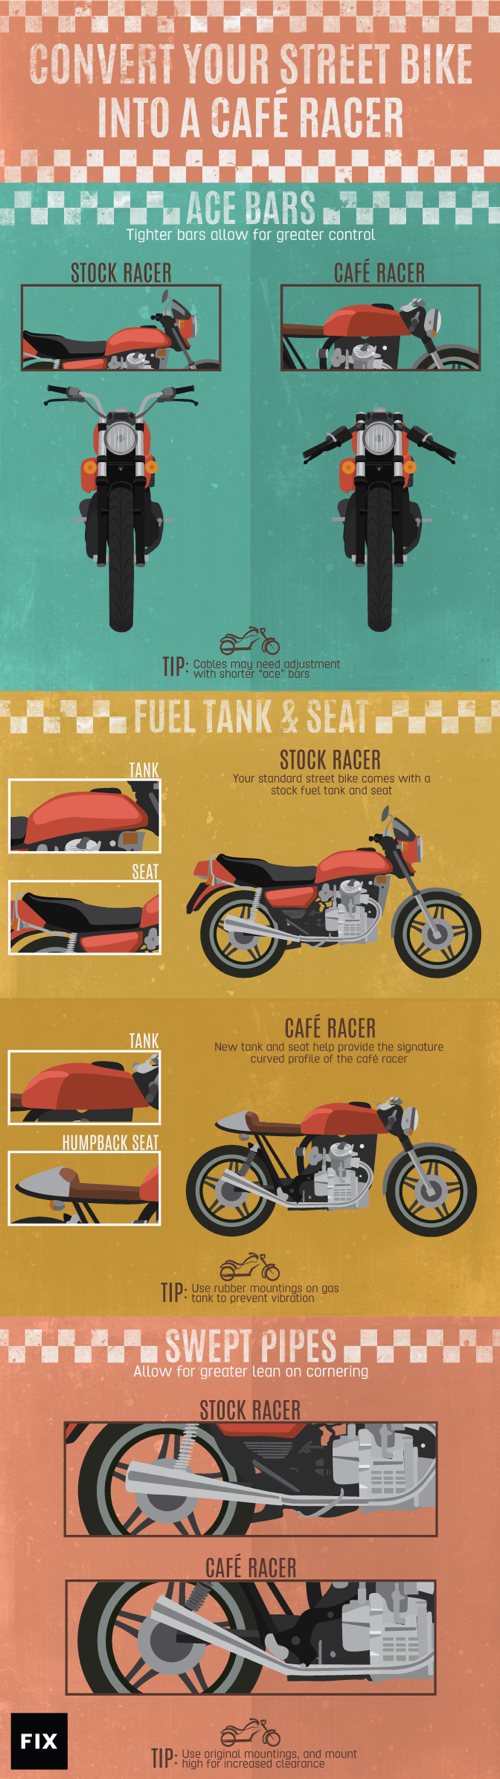 Convert Your Street Bike into a Café Racer infographic